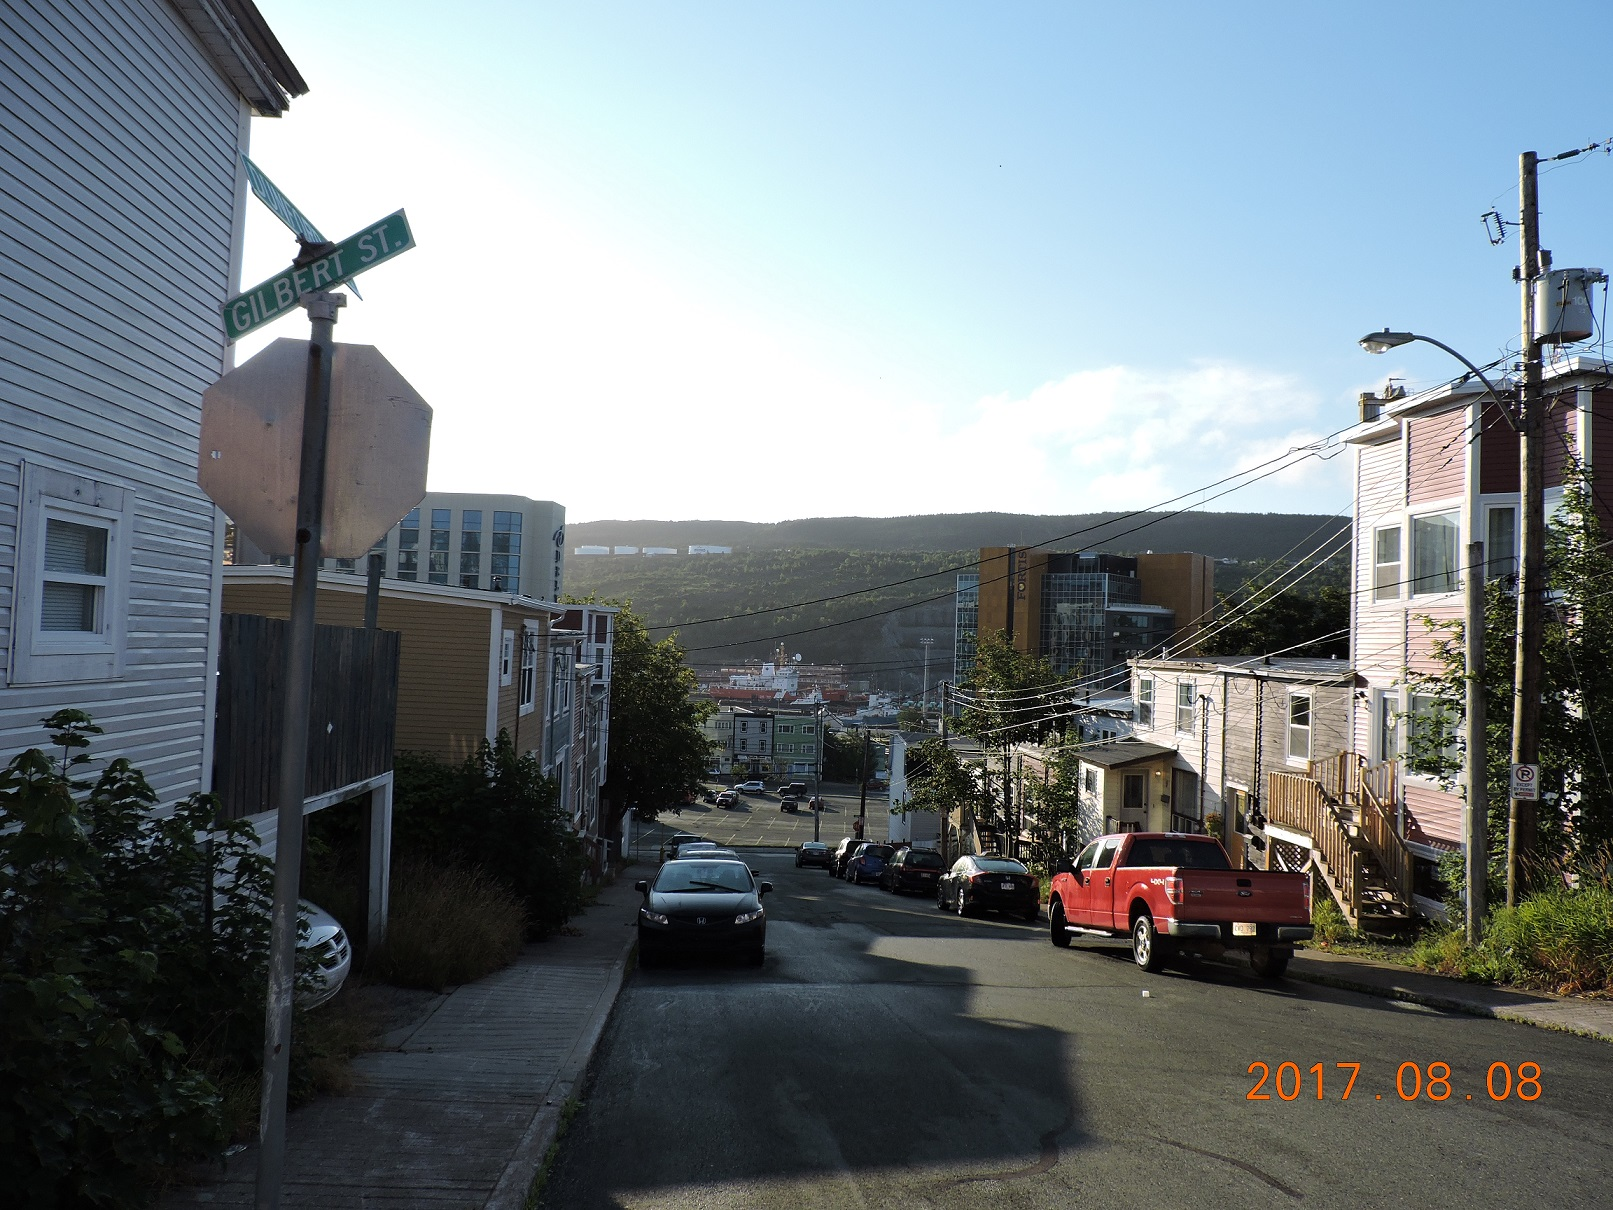 Hills.